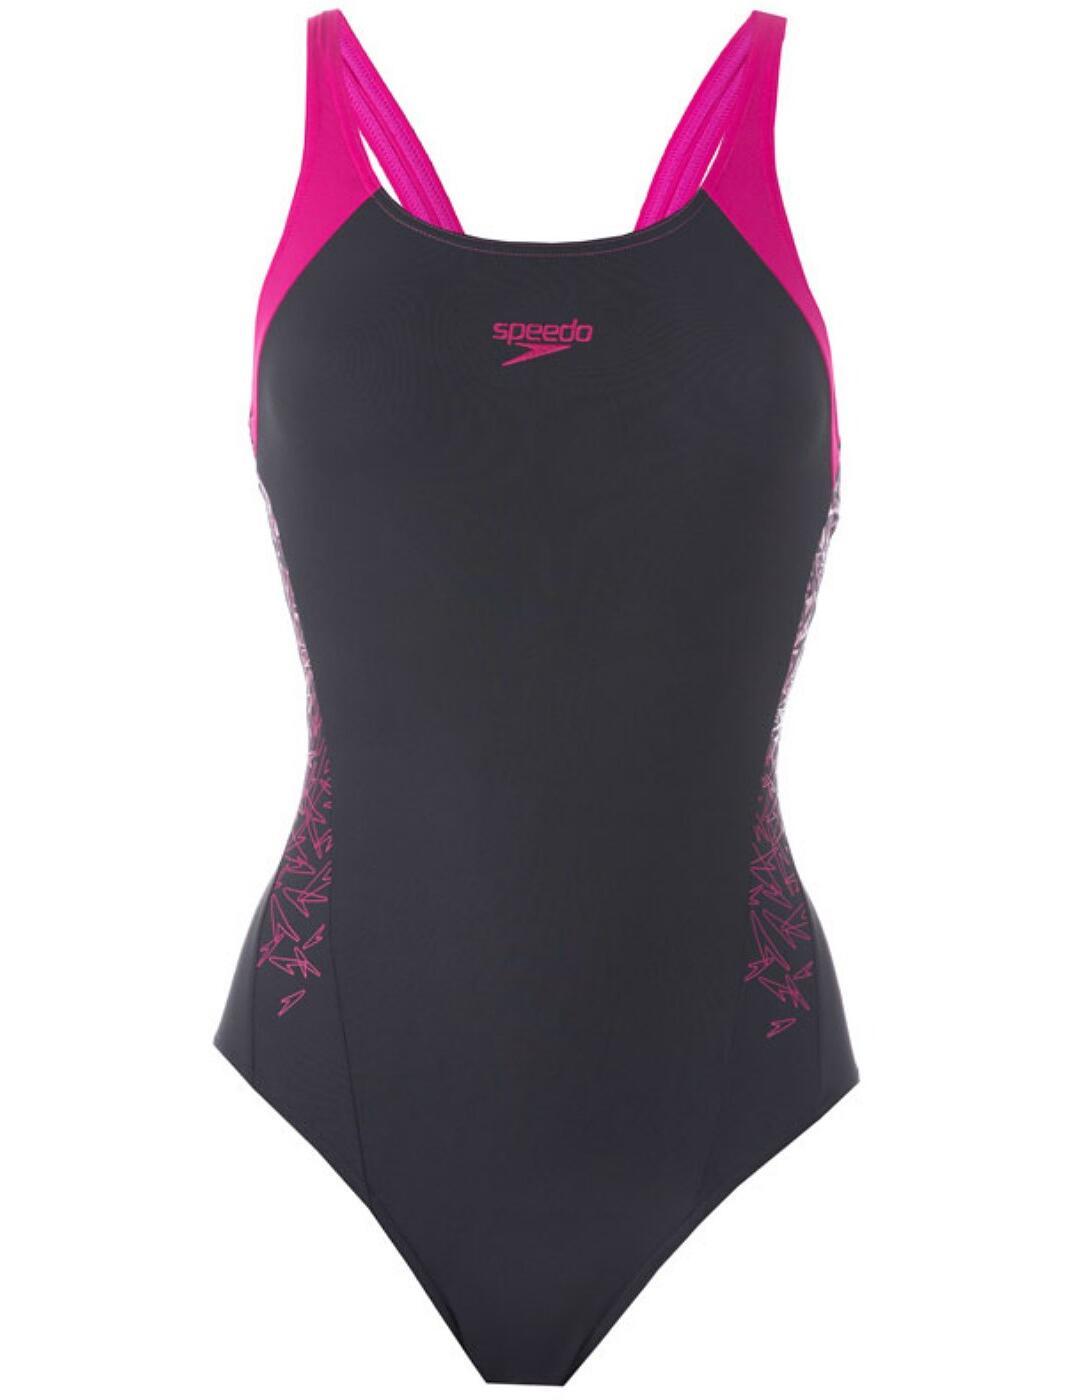 810821B374 Speedo Boom Splice Muscleback Swimsuit - 810821B374 Grey/Pink